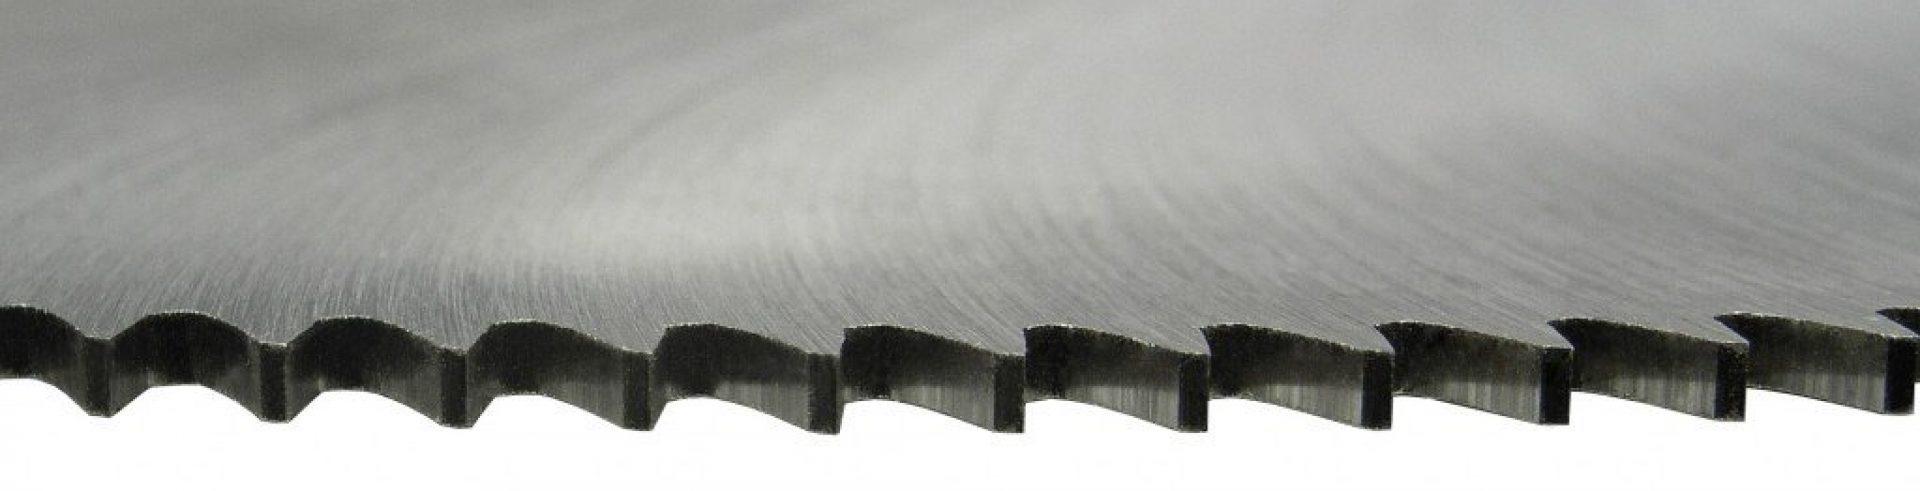 Riverside Tool & Carbide, Inc.